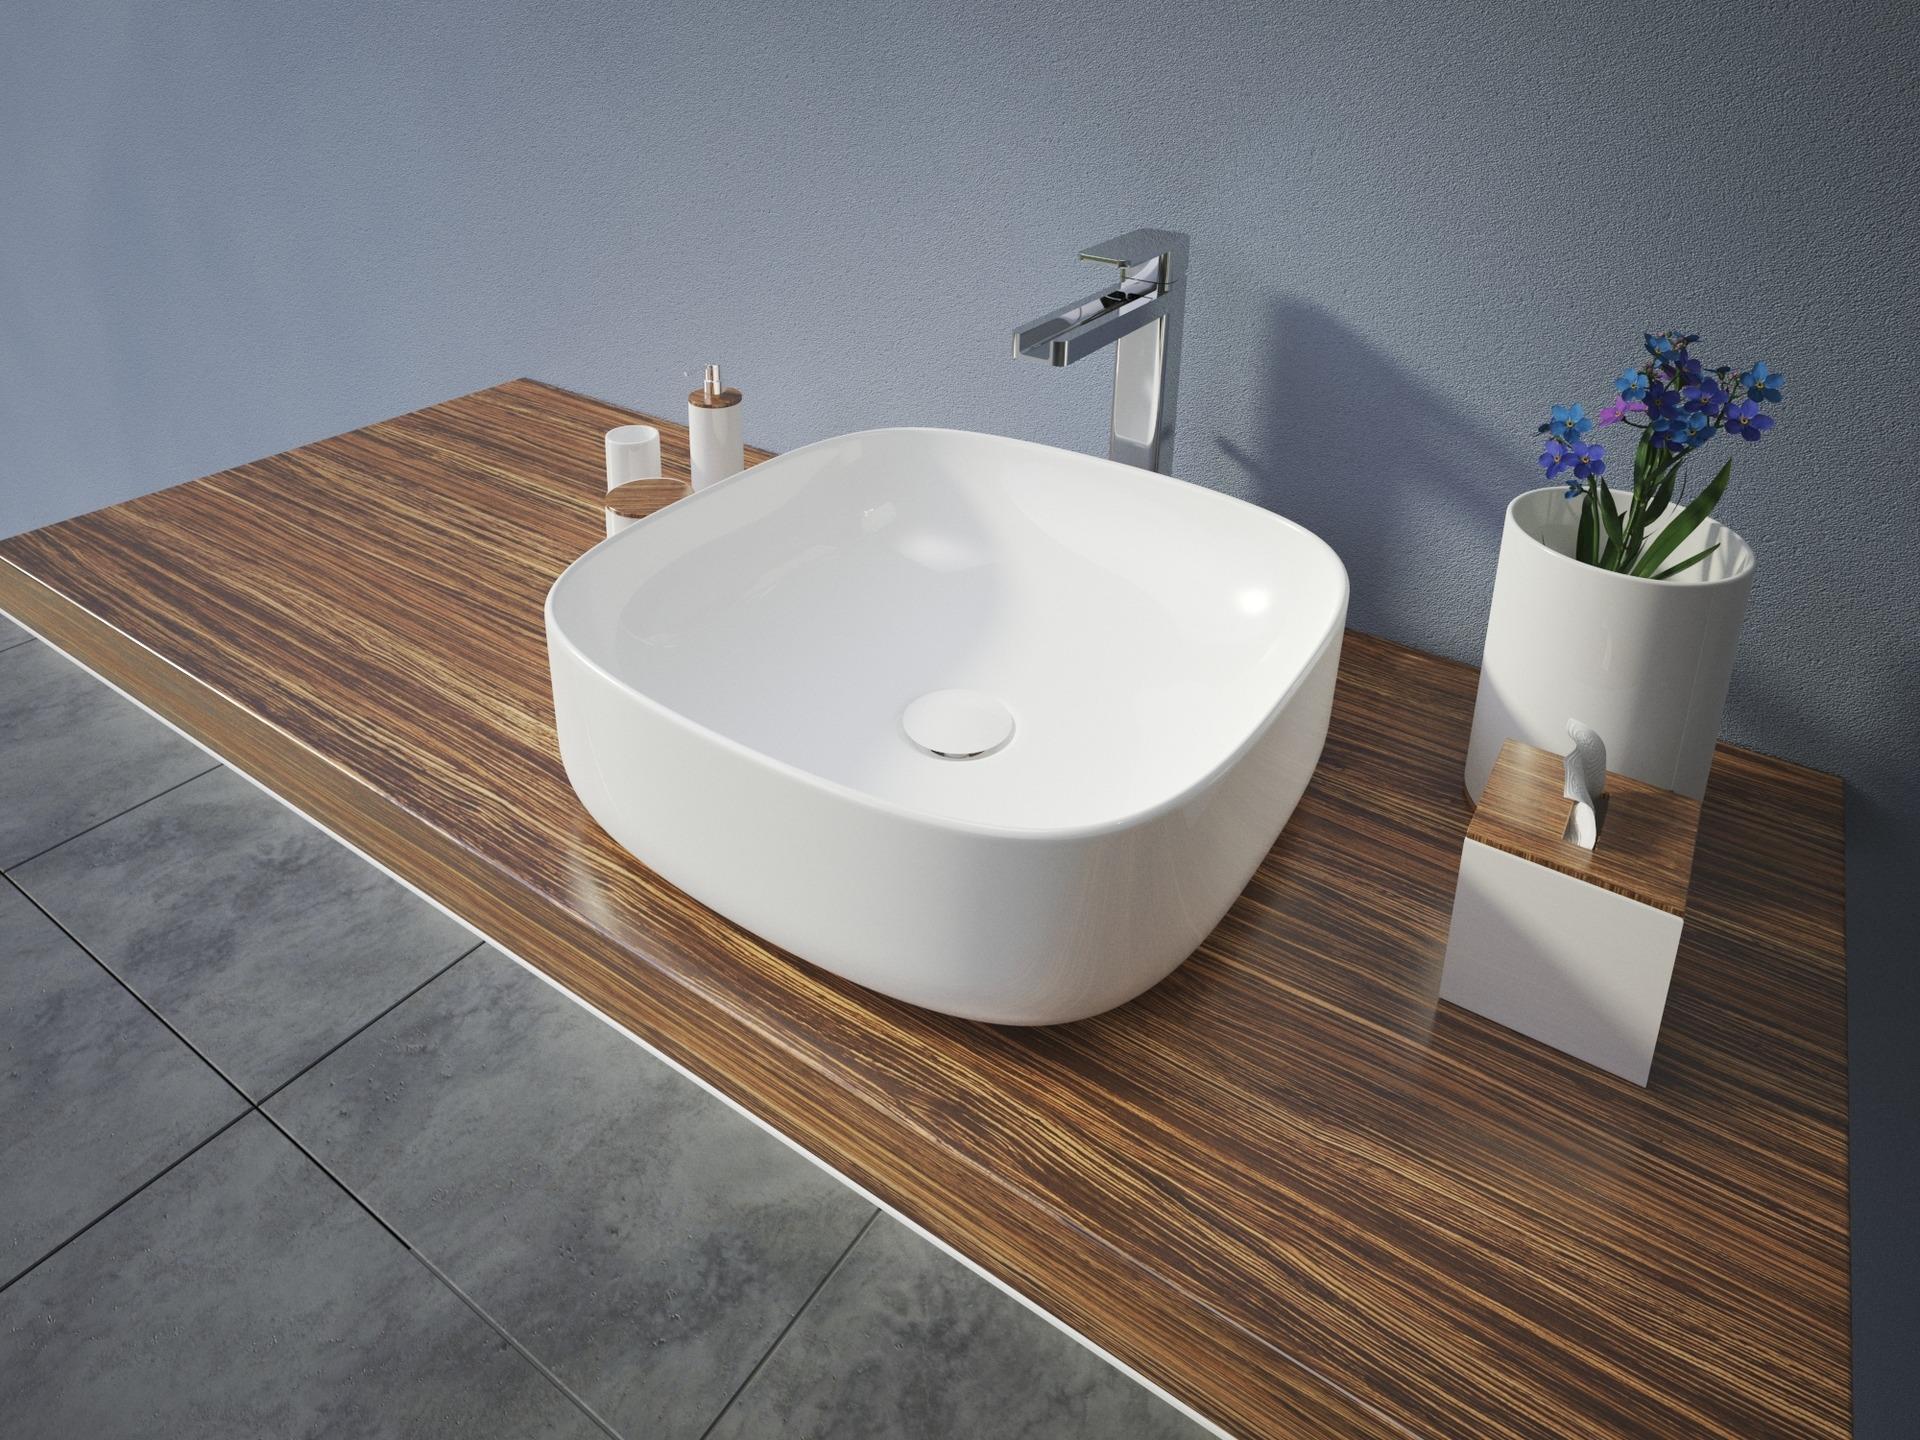 Aquatek Aquatek - OLIVER hranaté keramické umyvadlo se zaoblenými rohy 42,5x42,5x13,5 cm (OLIVER)